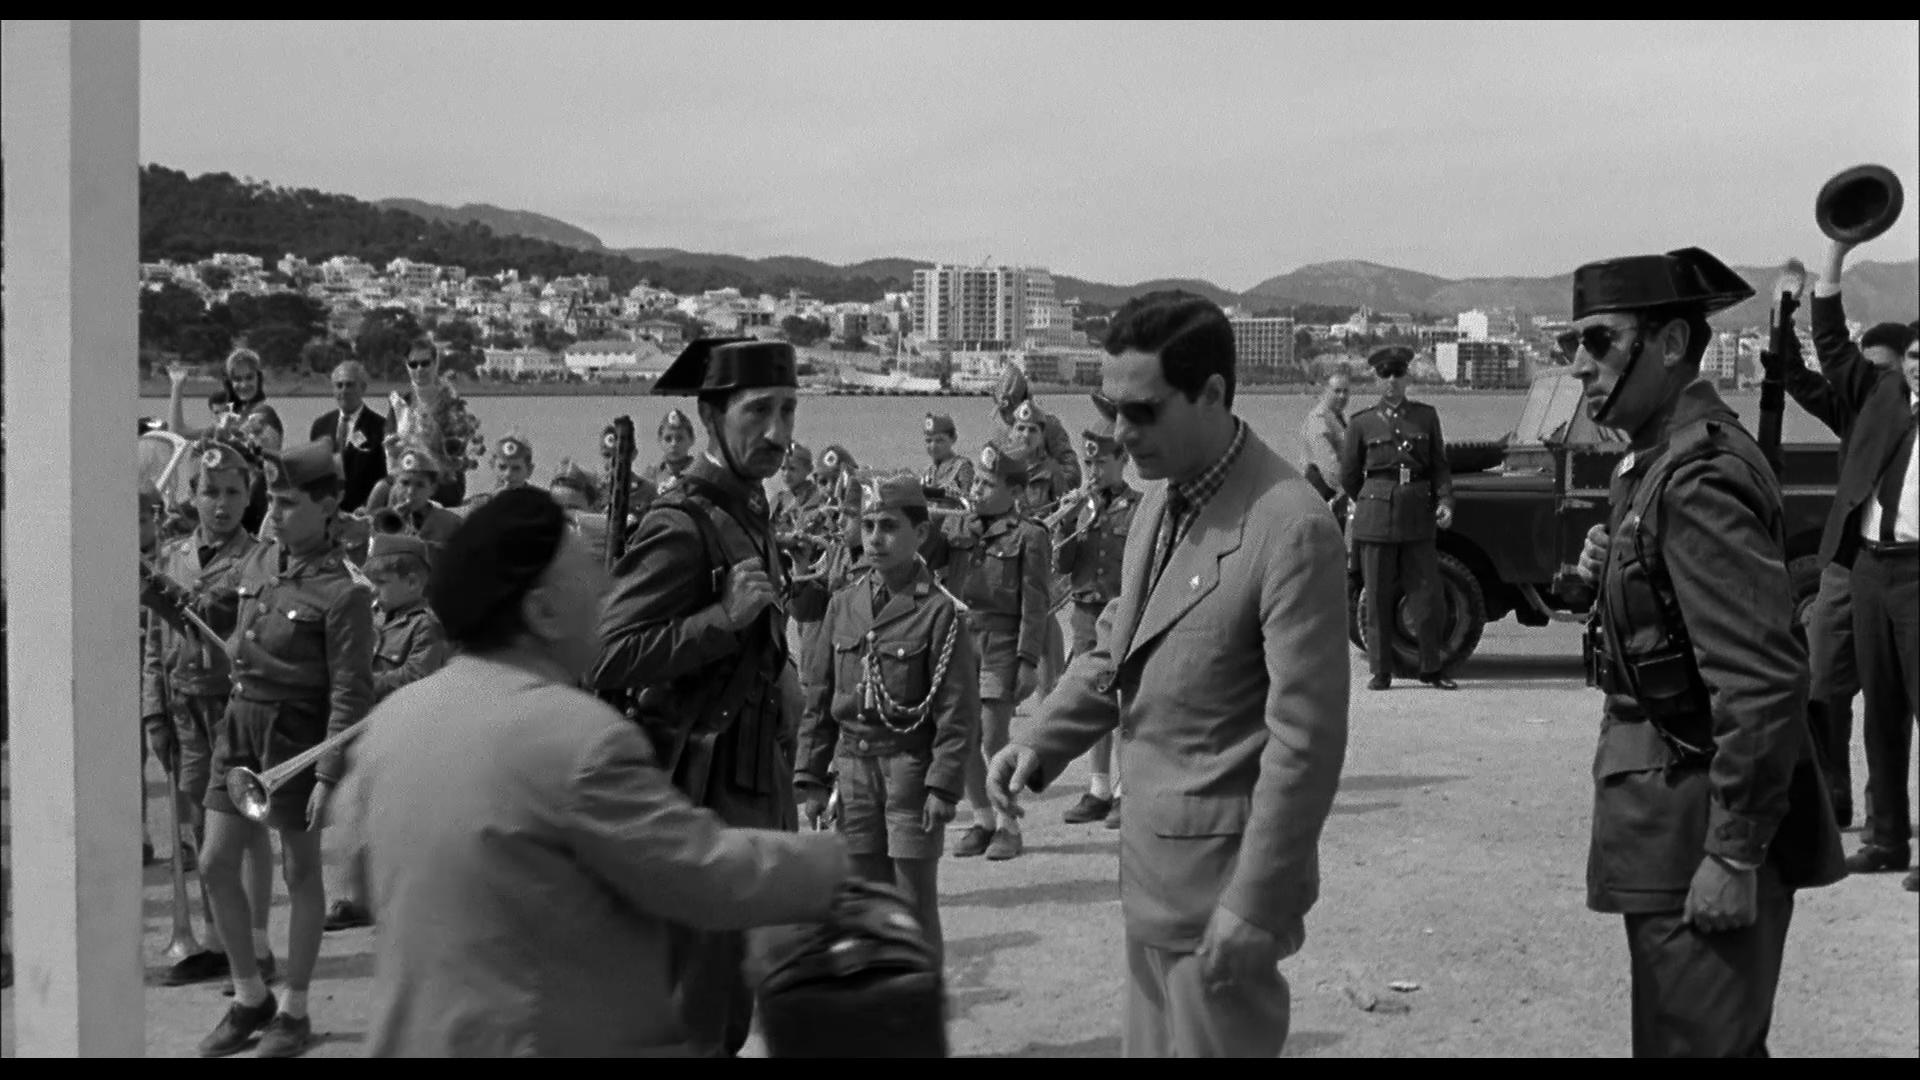 Mostra Venecia verdugo censura franquismo Mallorca